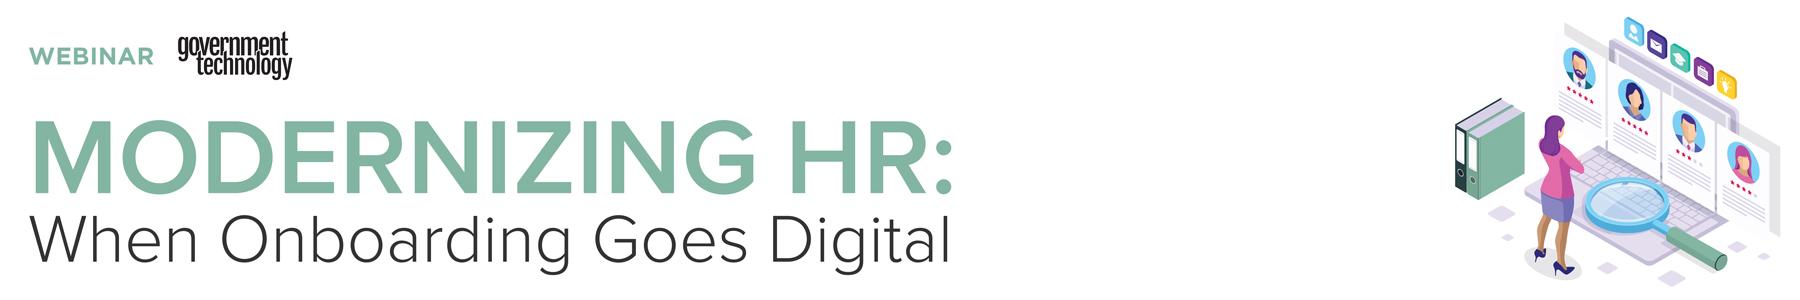 Modernizing HR: When Onboarding Goes Digital